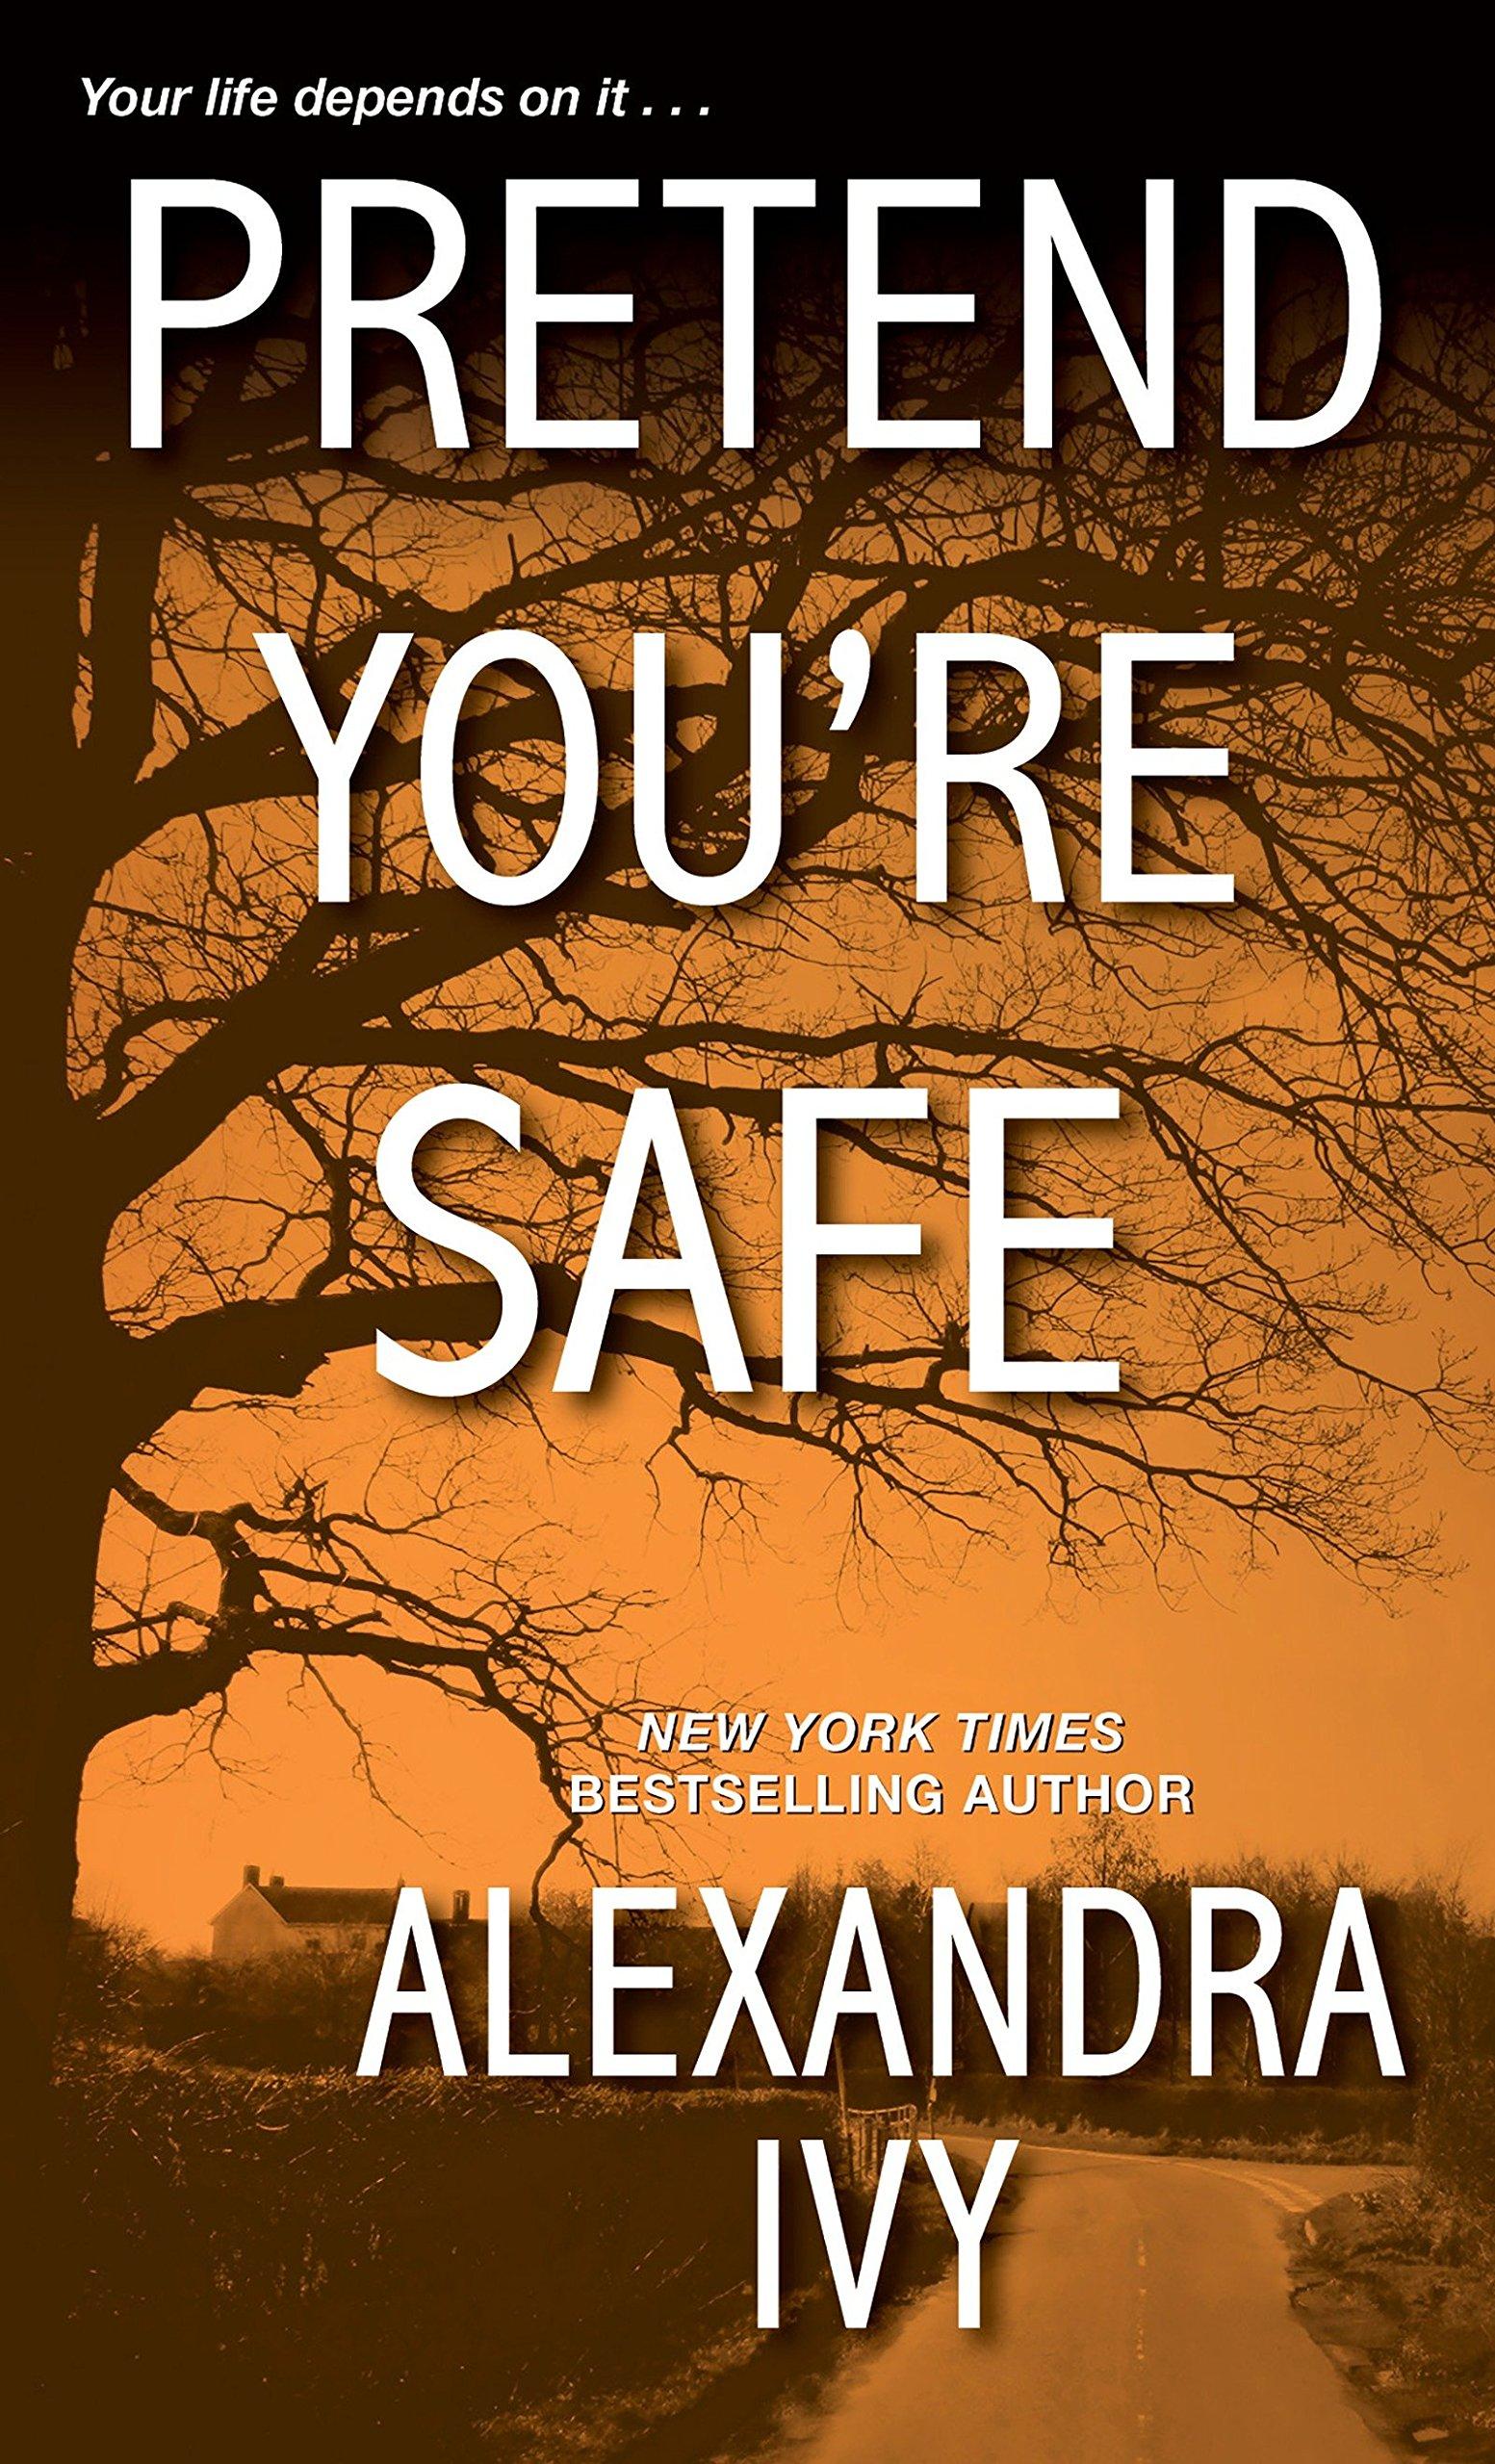 Alexandra Ivy: biography and creativity 42